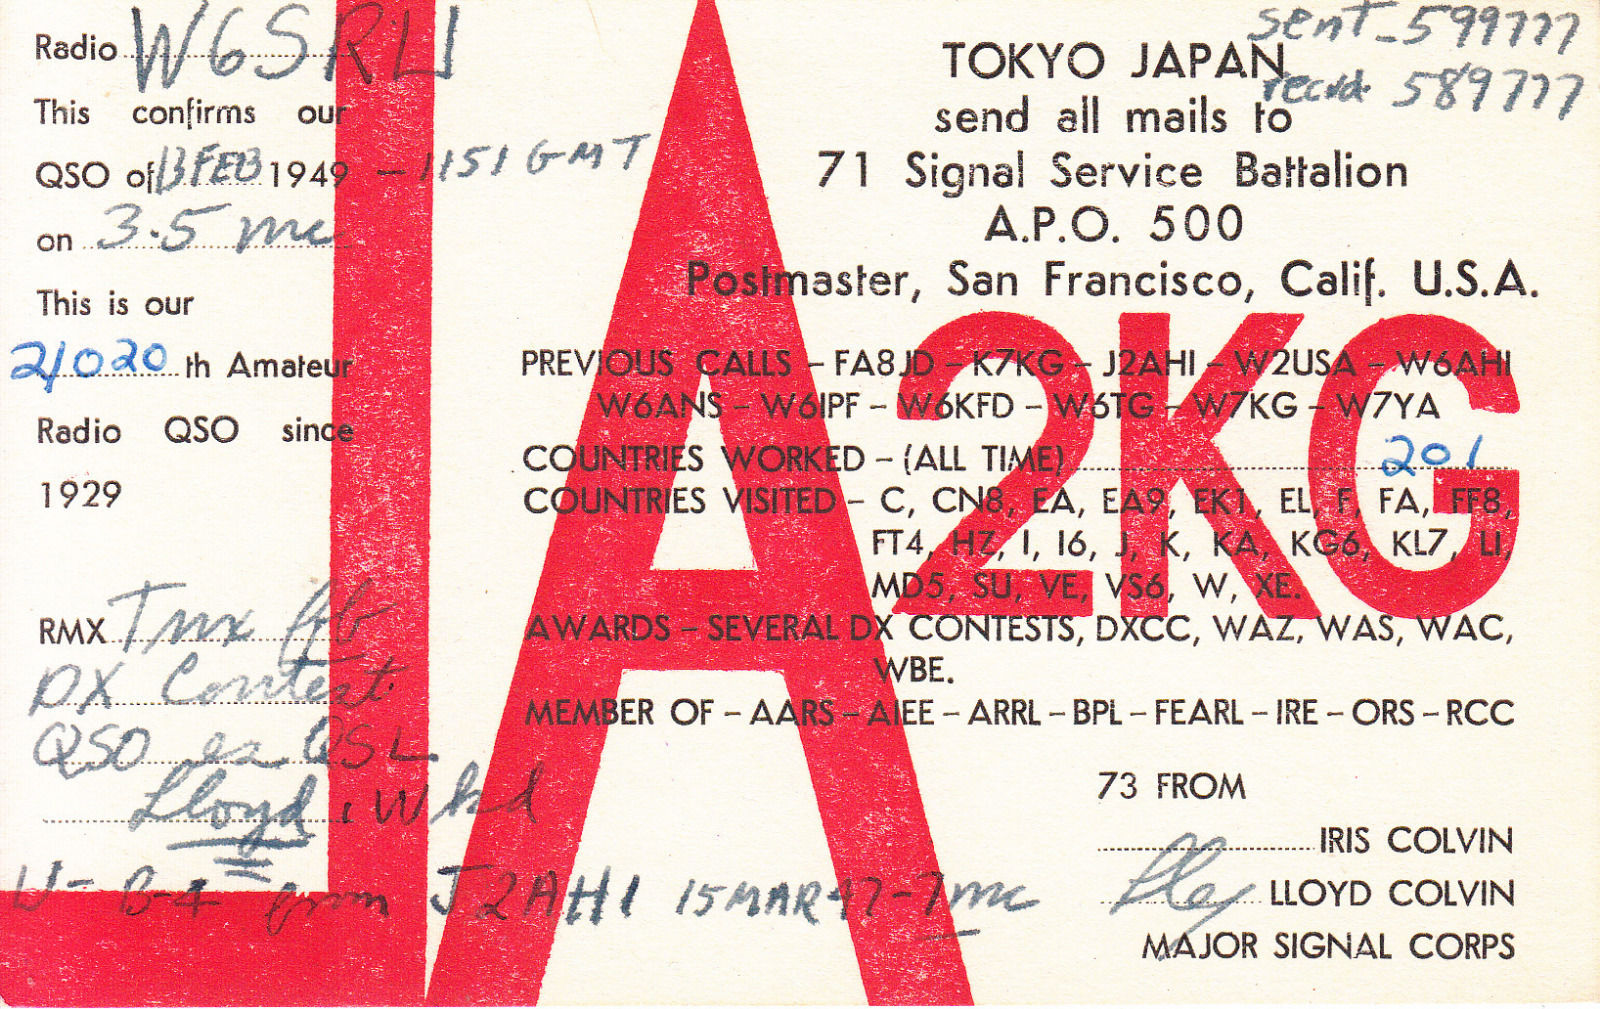 Нажмите на изображение для увеличения.  Название:9) ja2kg lloyd colvin 1947.jpg Просмотров:41 Размер:470.6 Кб ID:169984